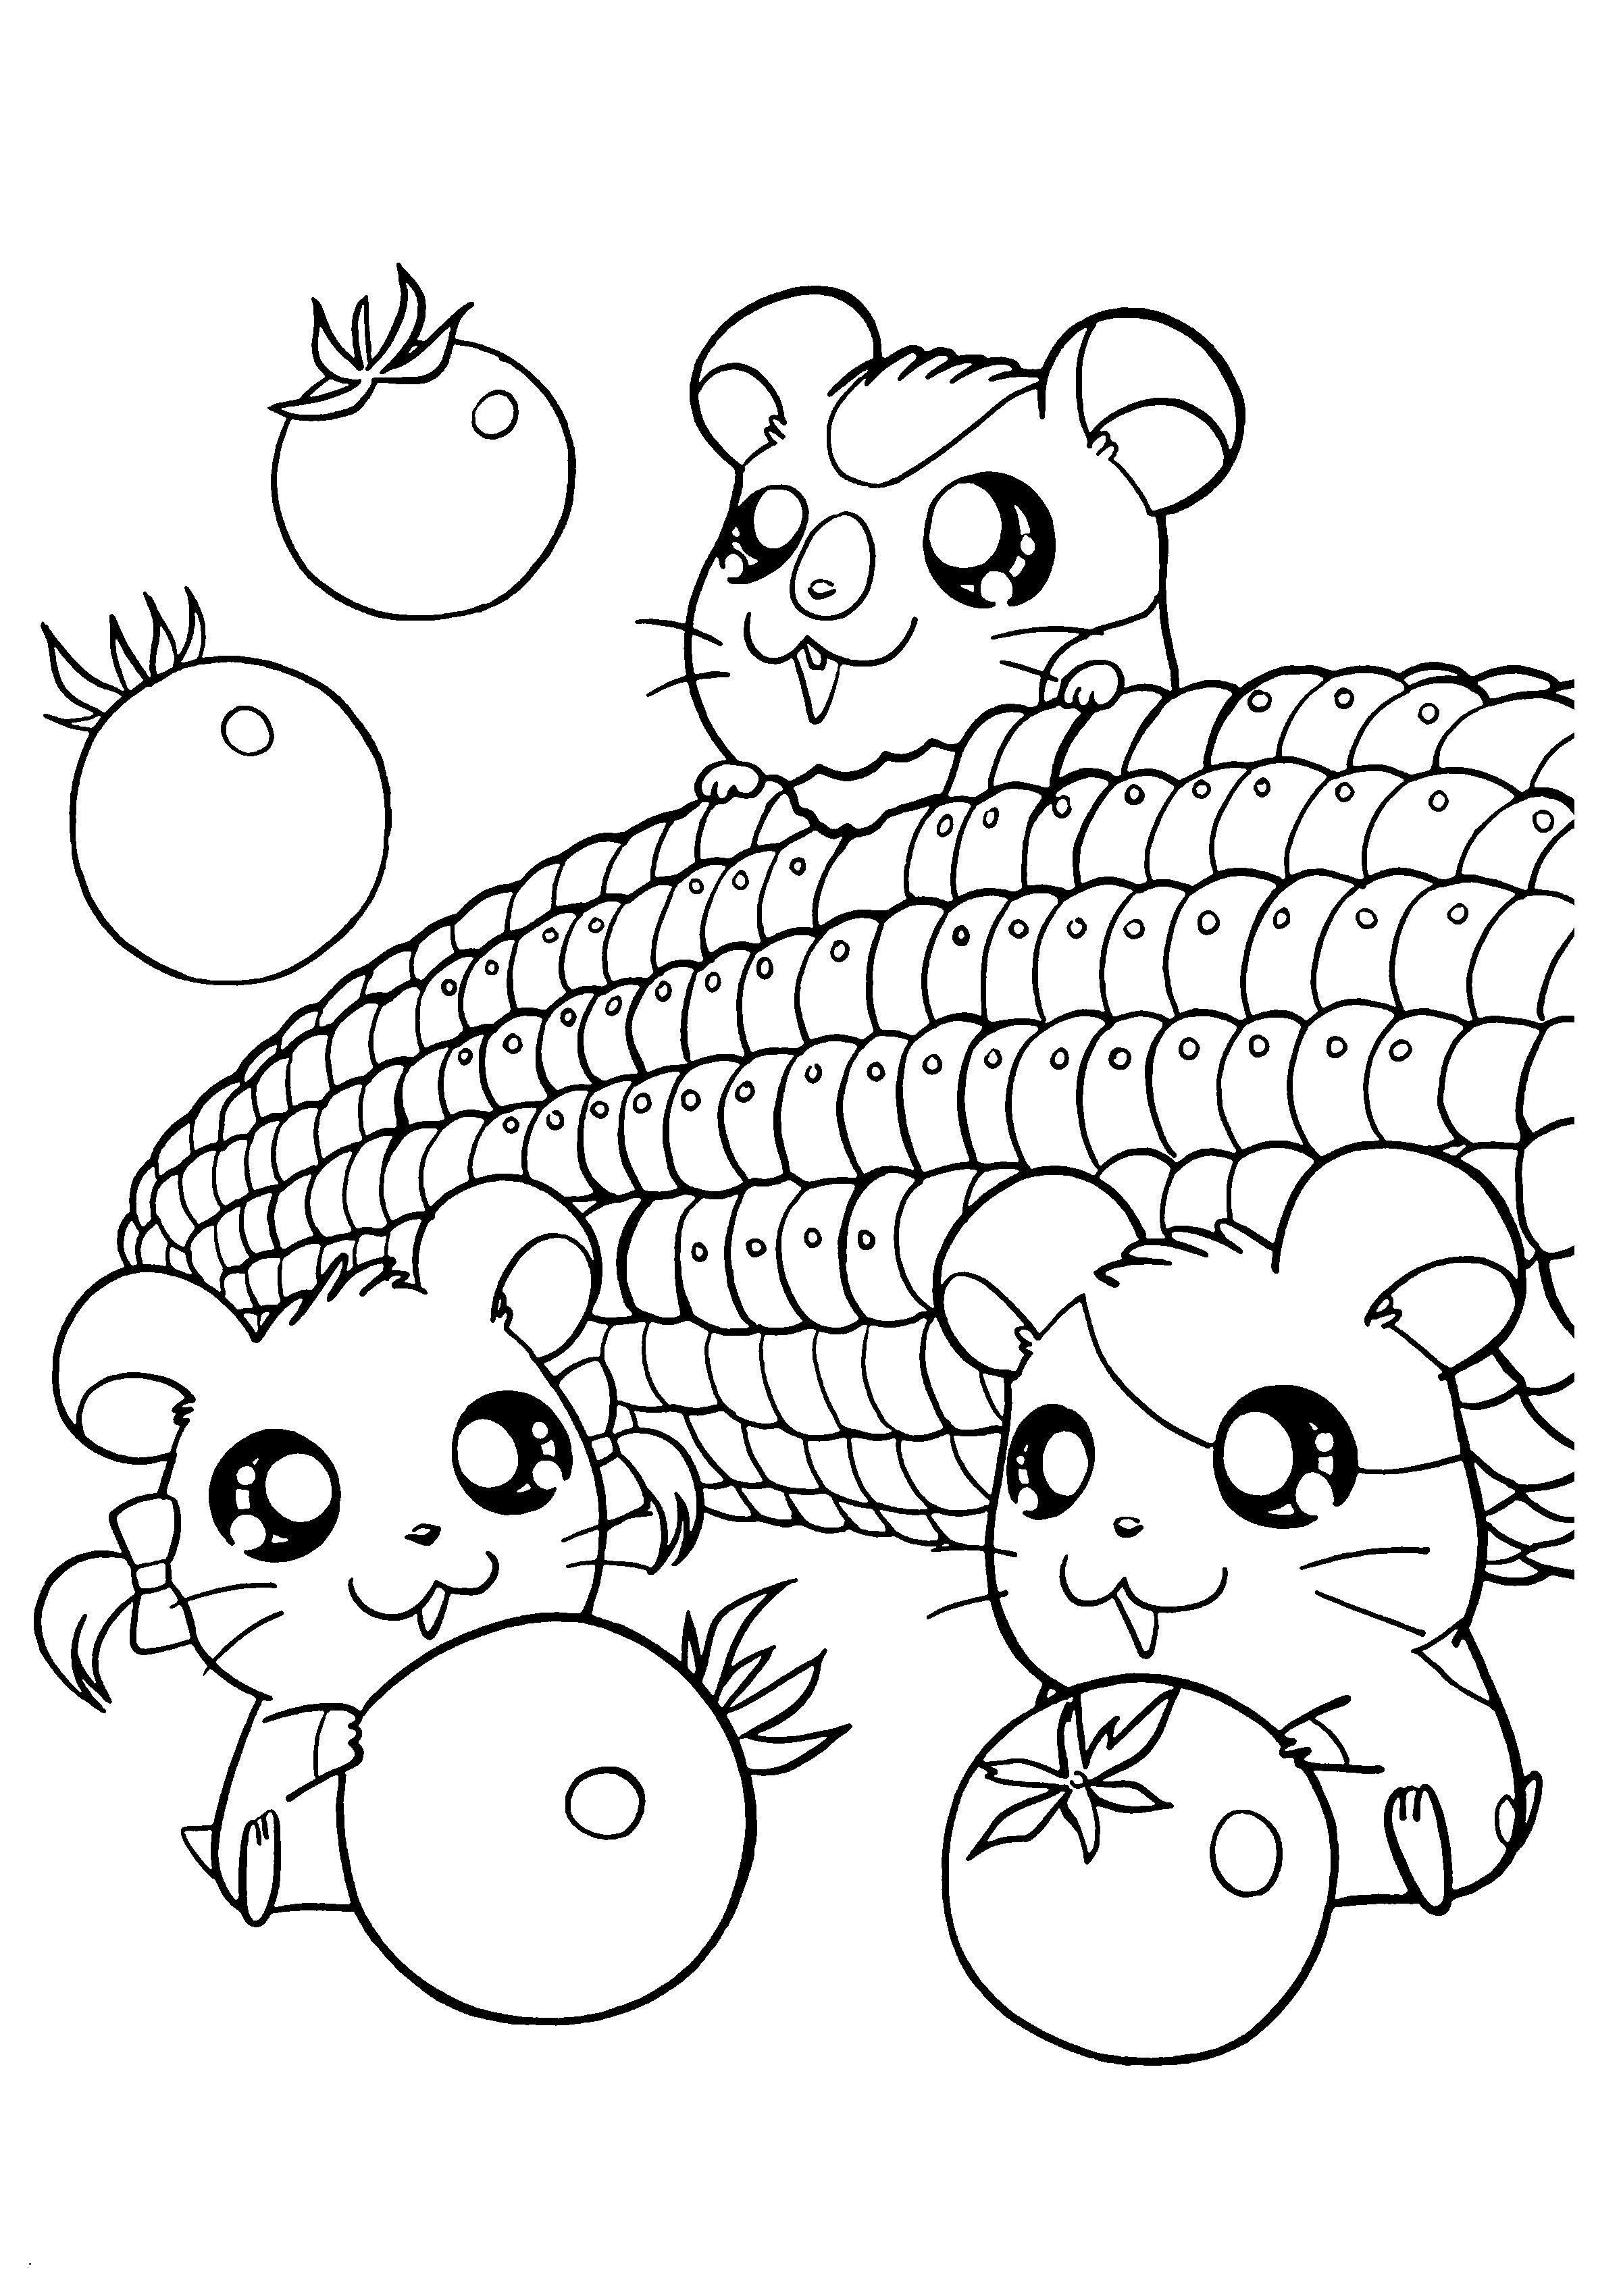 Hello Kitty Ausmalbild Genial 40 Skizze Ausmalbilder Hello Kitty Treehouse Nyc Bilder